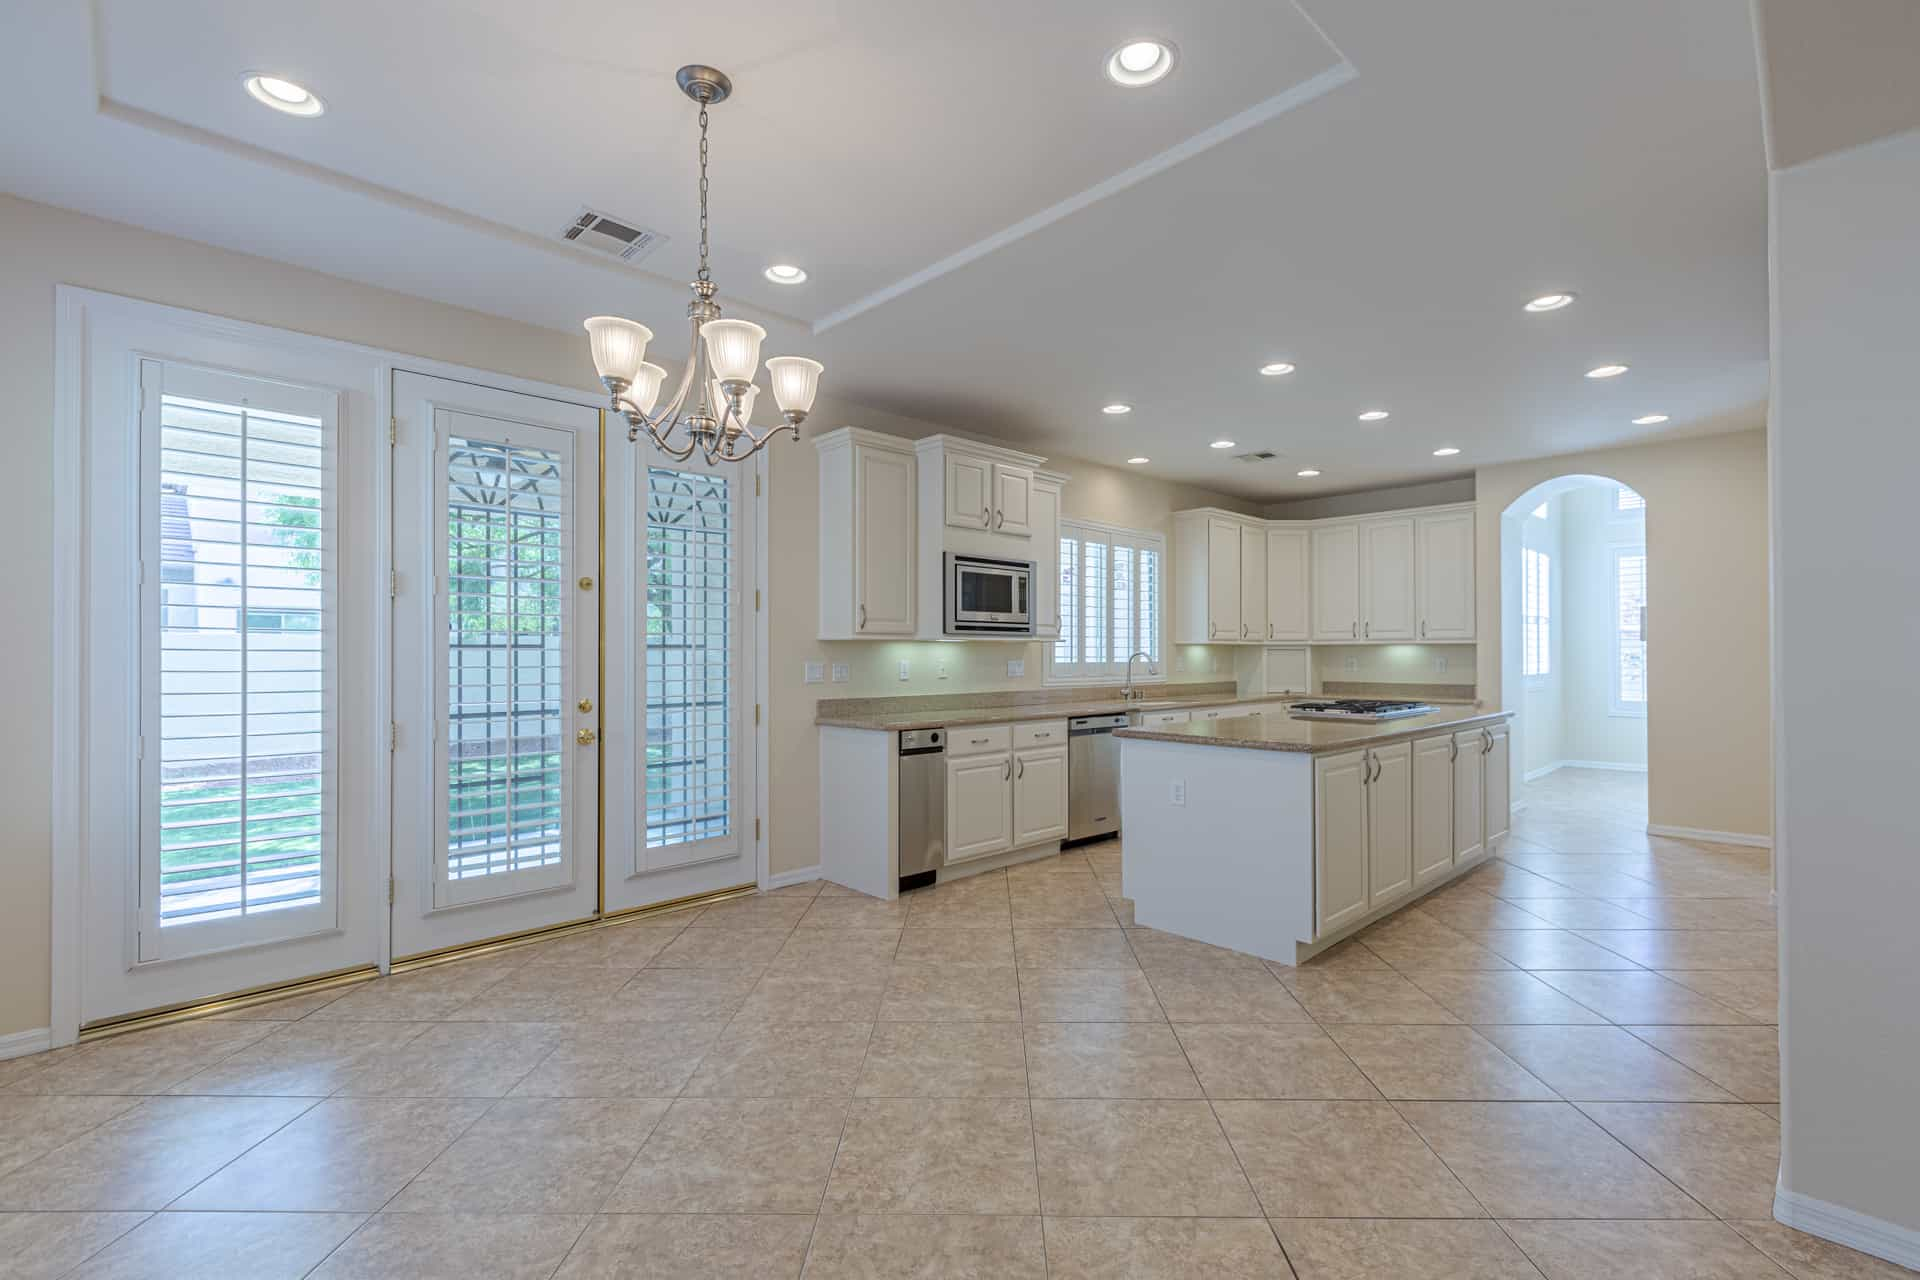 las-vegas-luxry-real-estate-realtor-rob-jensen-company-10729-grey-havens-court-willow-creek1657